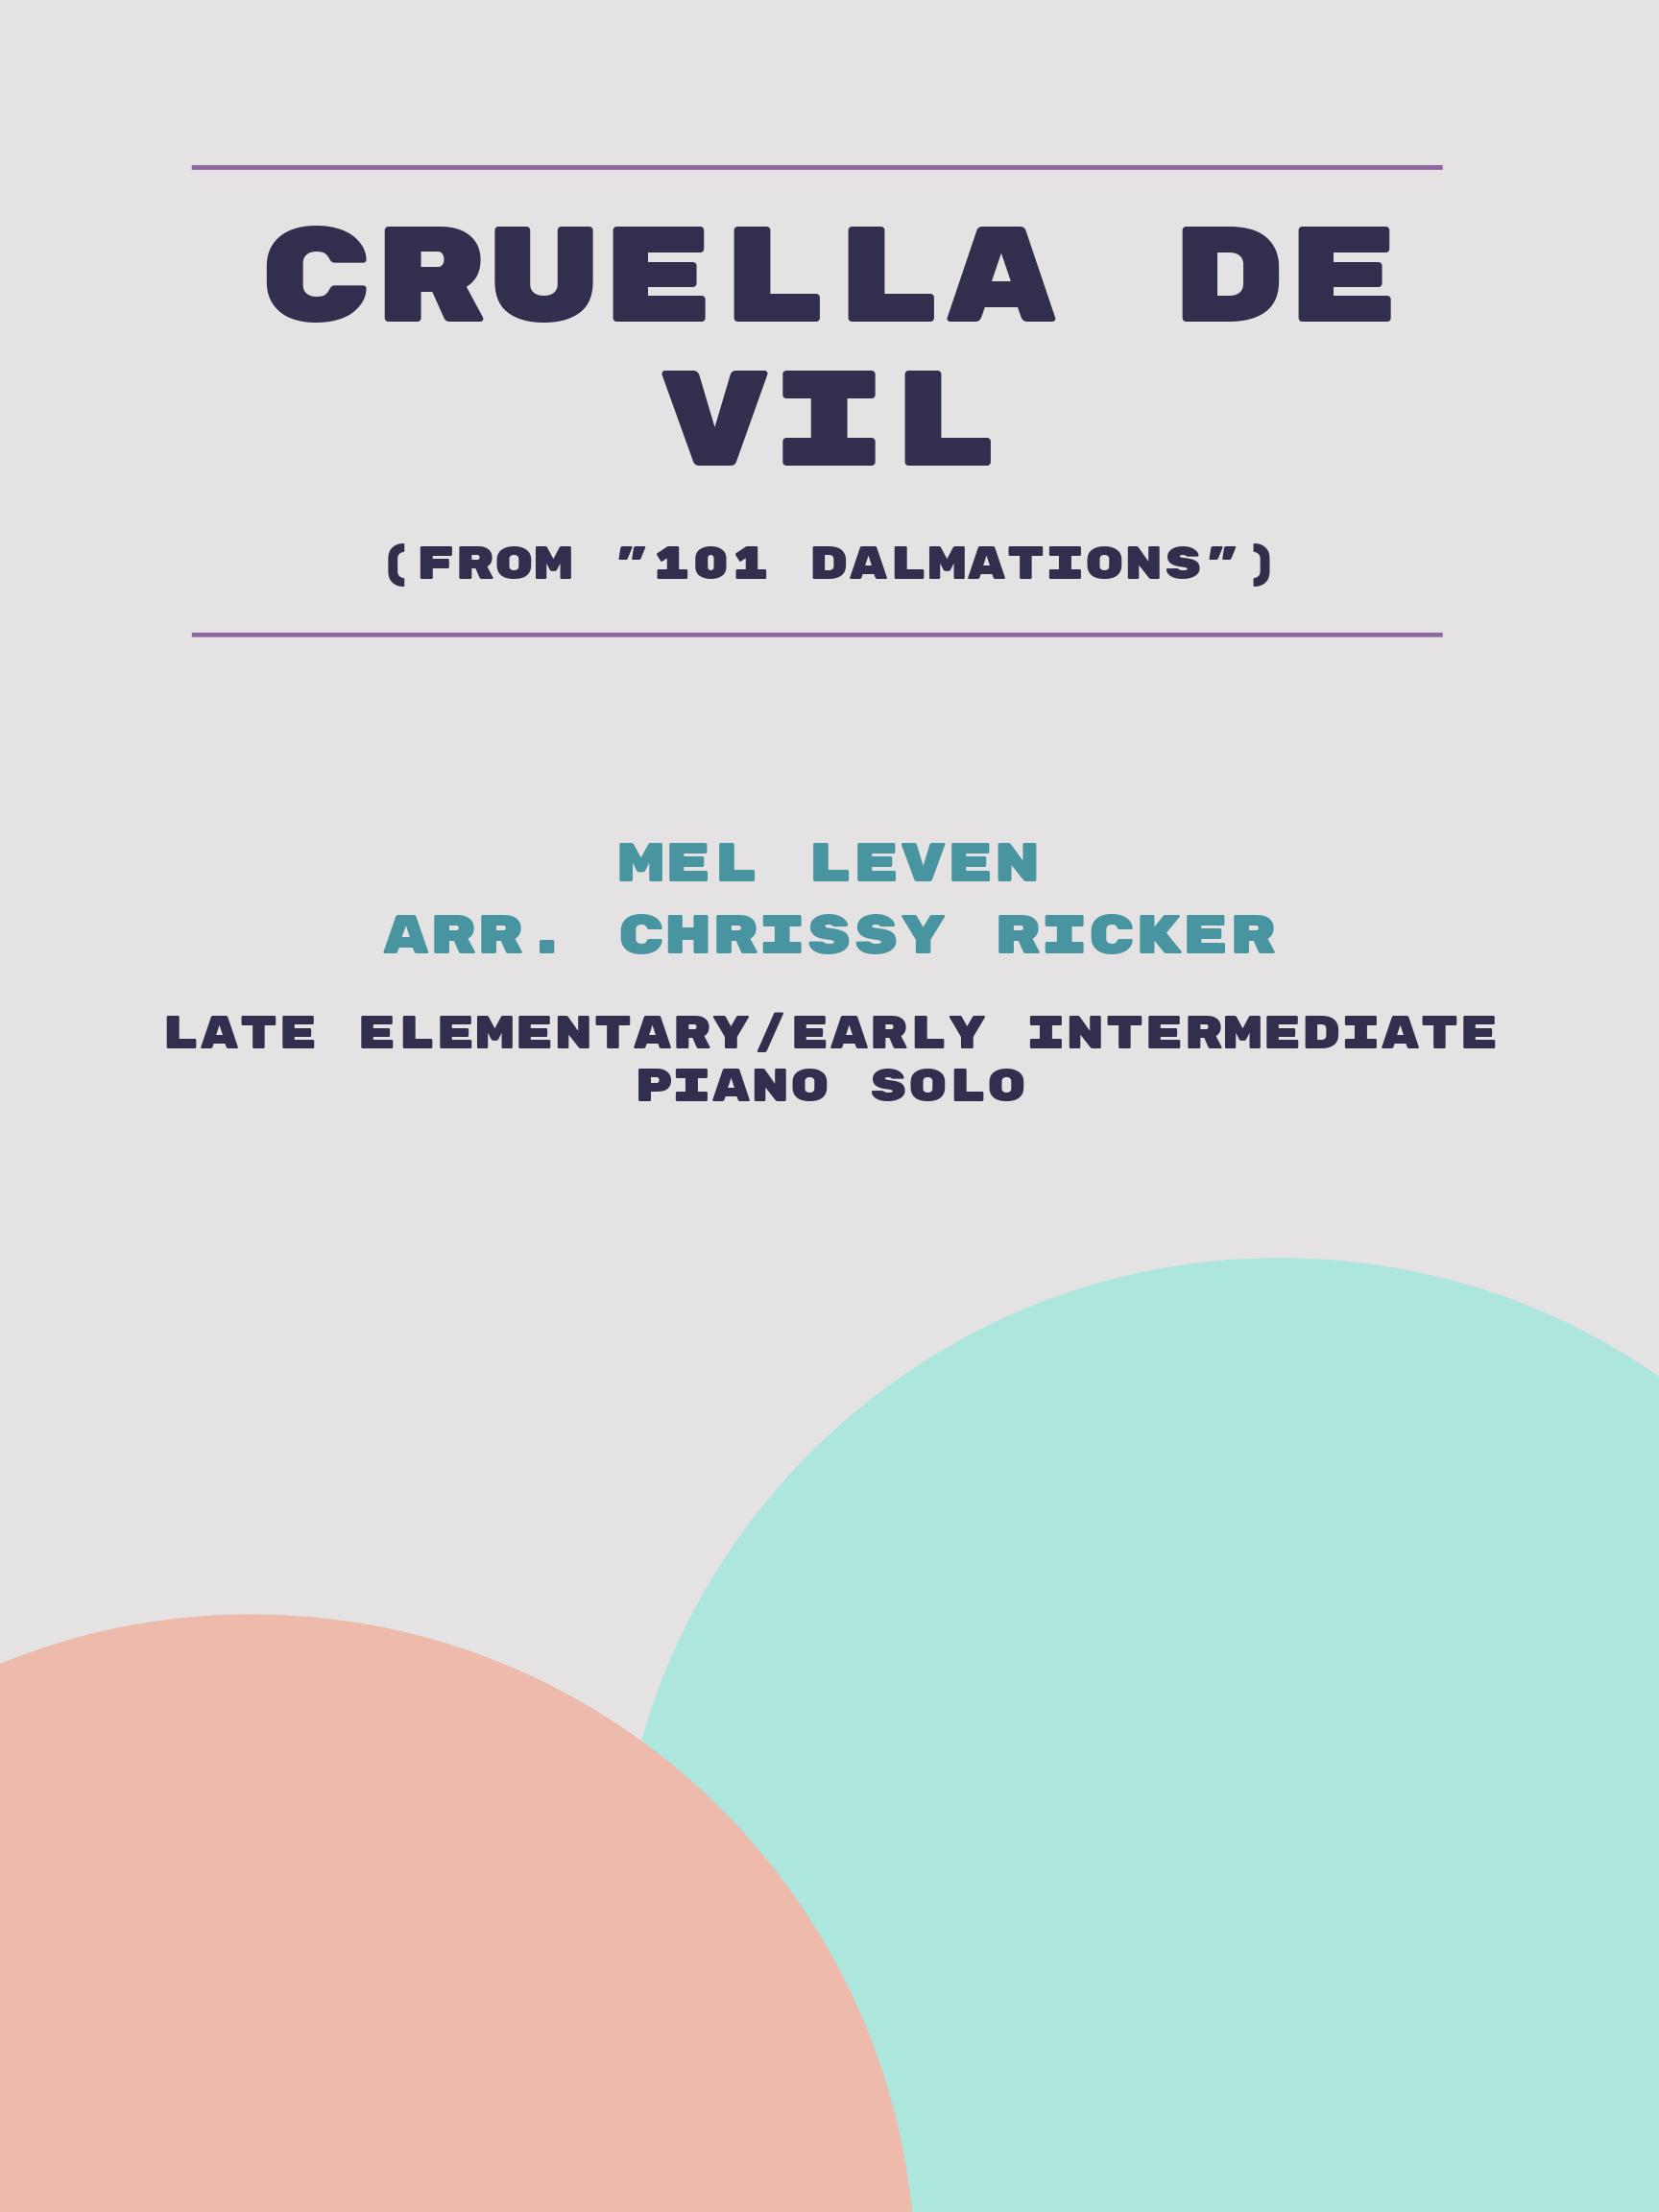 Cruella de Vil by Mel Leven